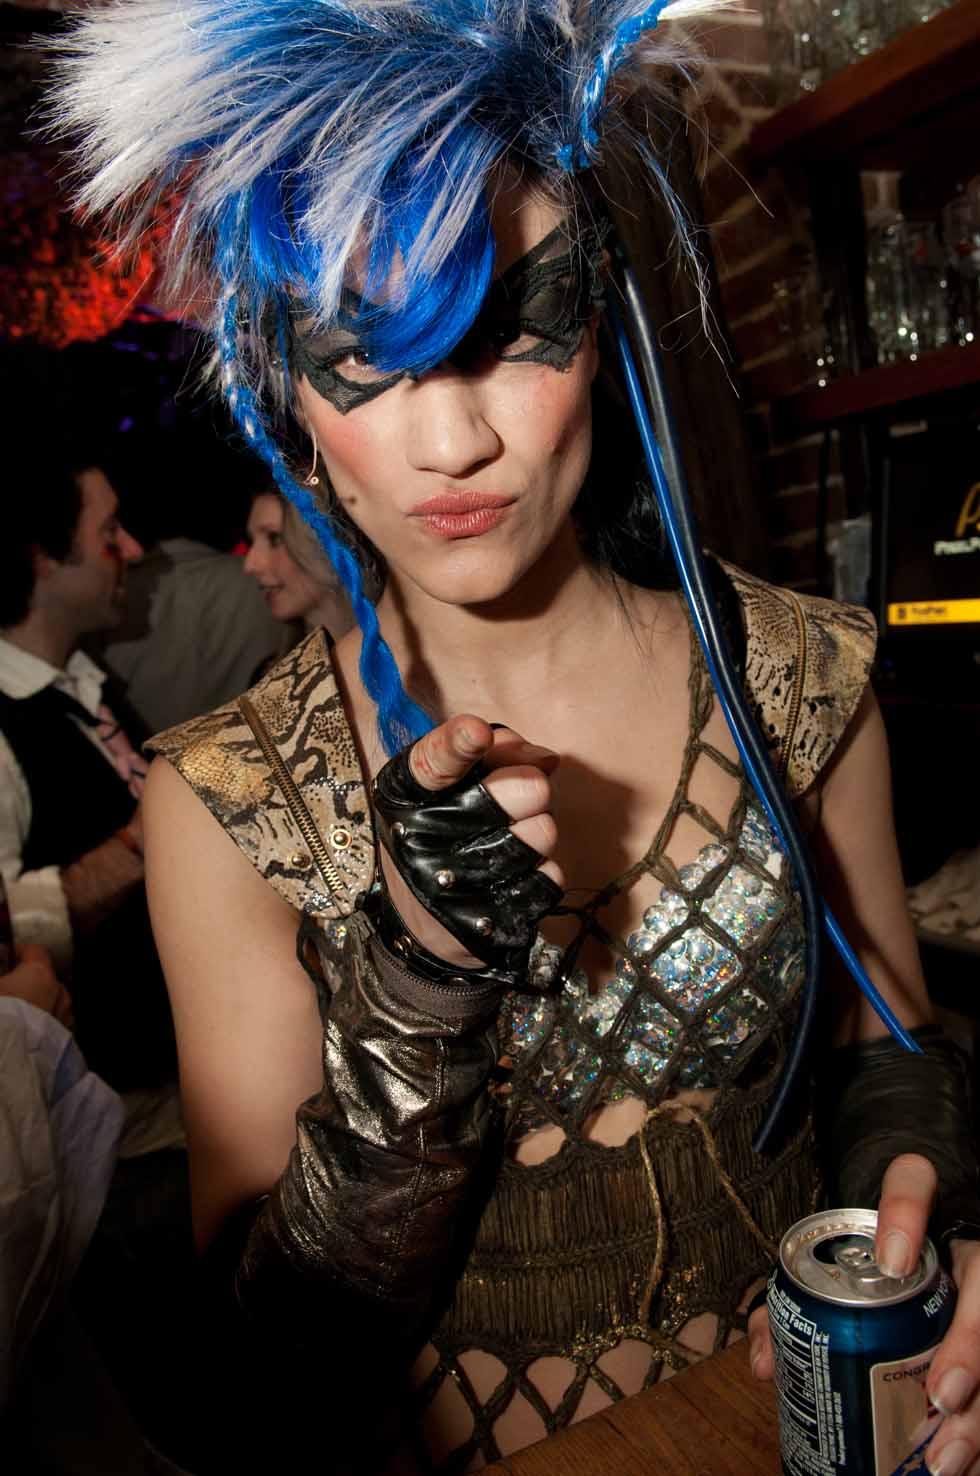 zum-schneider-nyc-2012-karneval-apocalyptika-3892.jpg